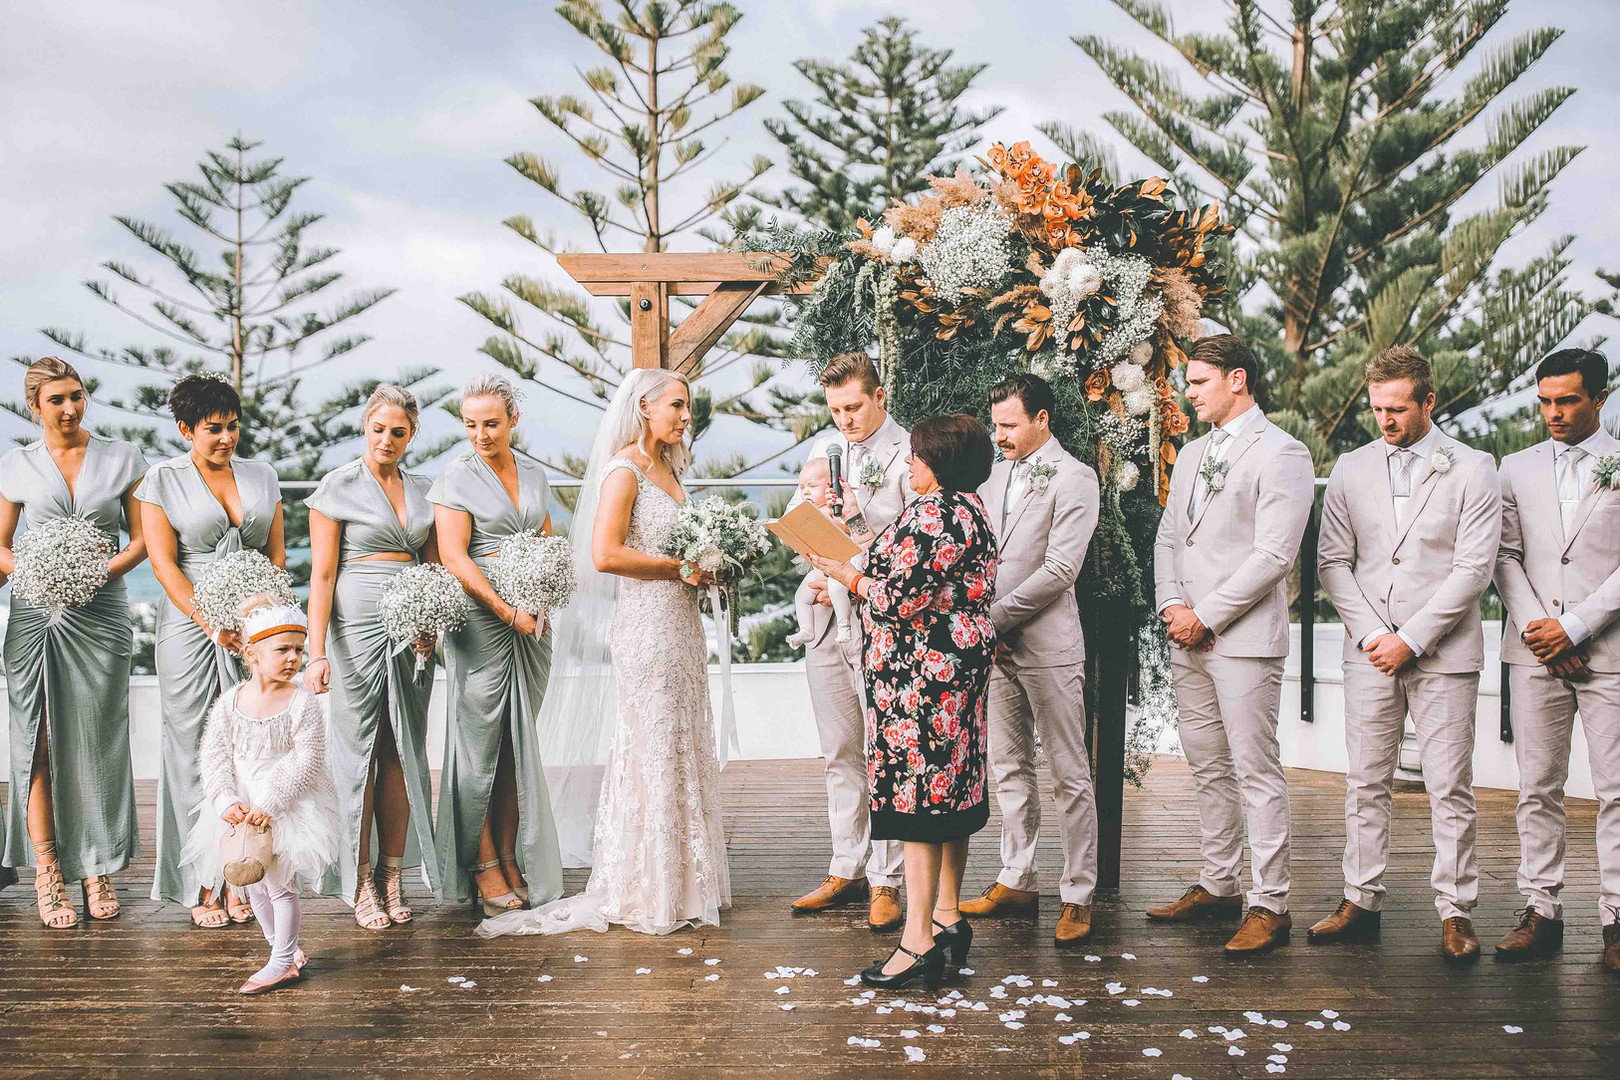 WeddingWebsite_Compressed-69.jpg